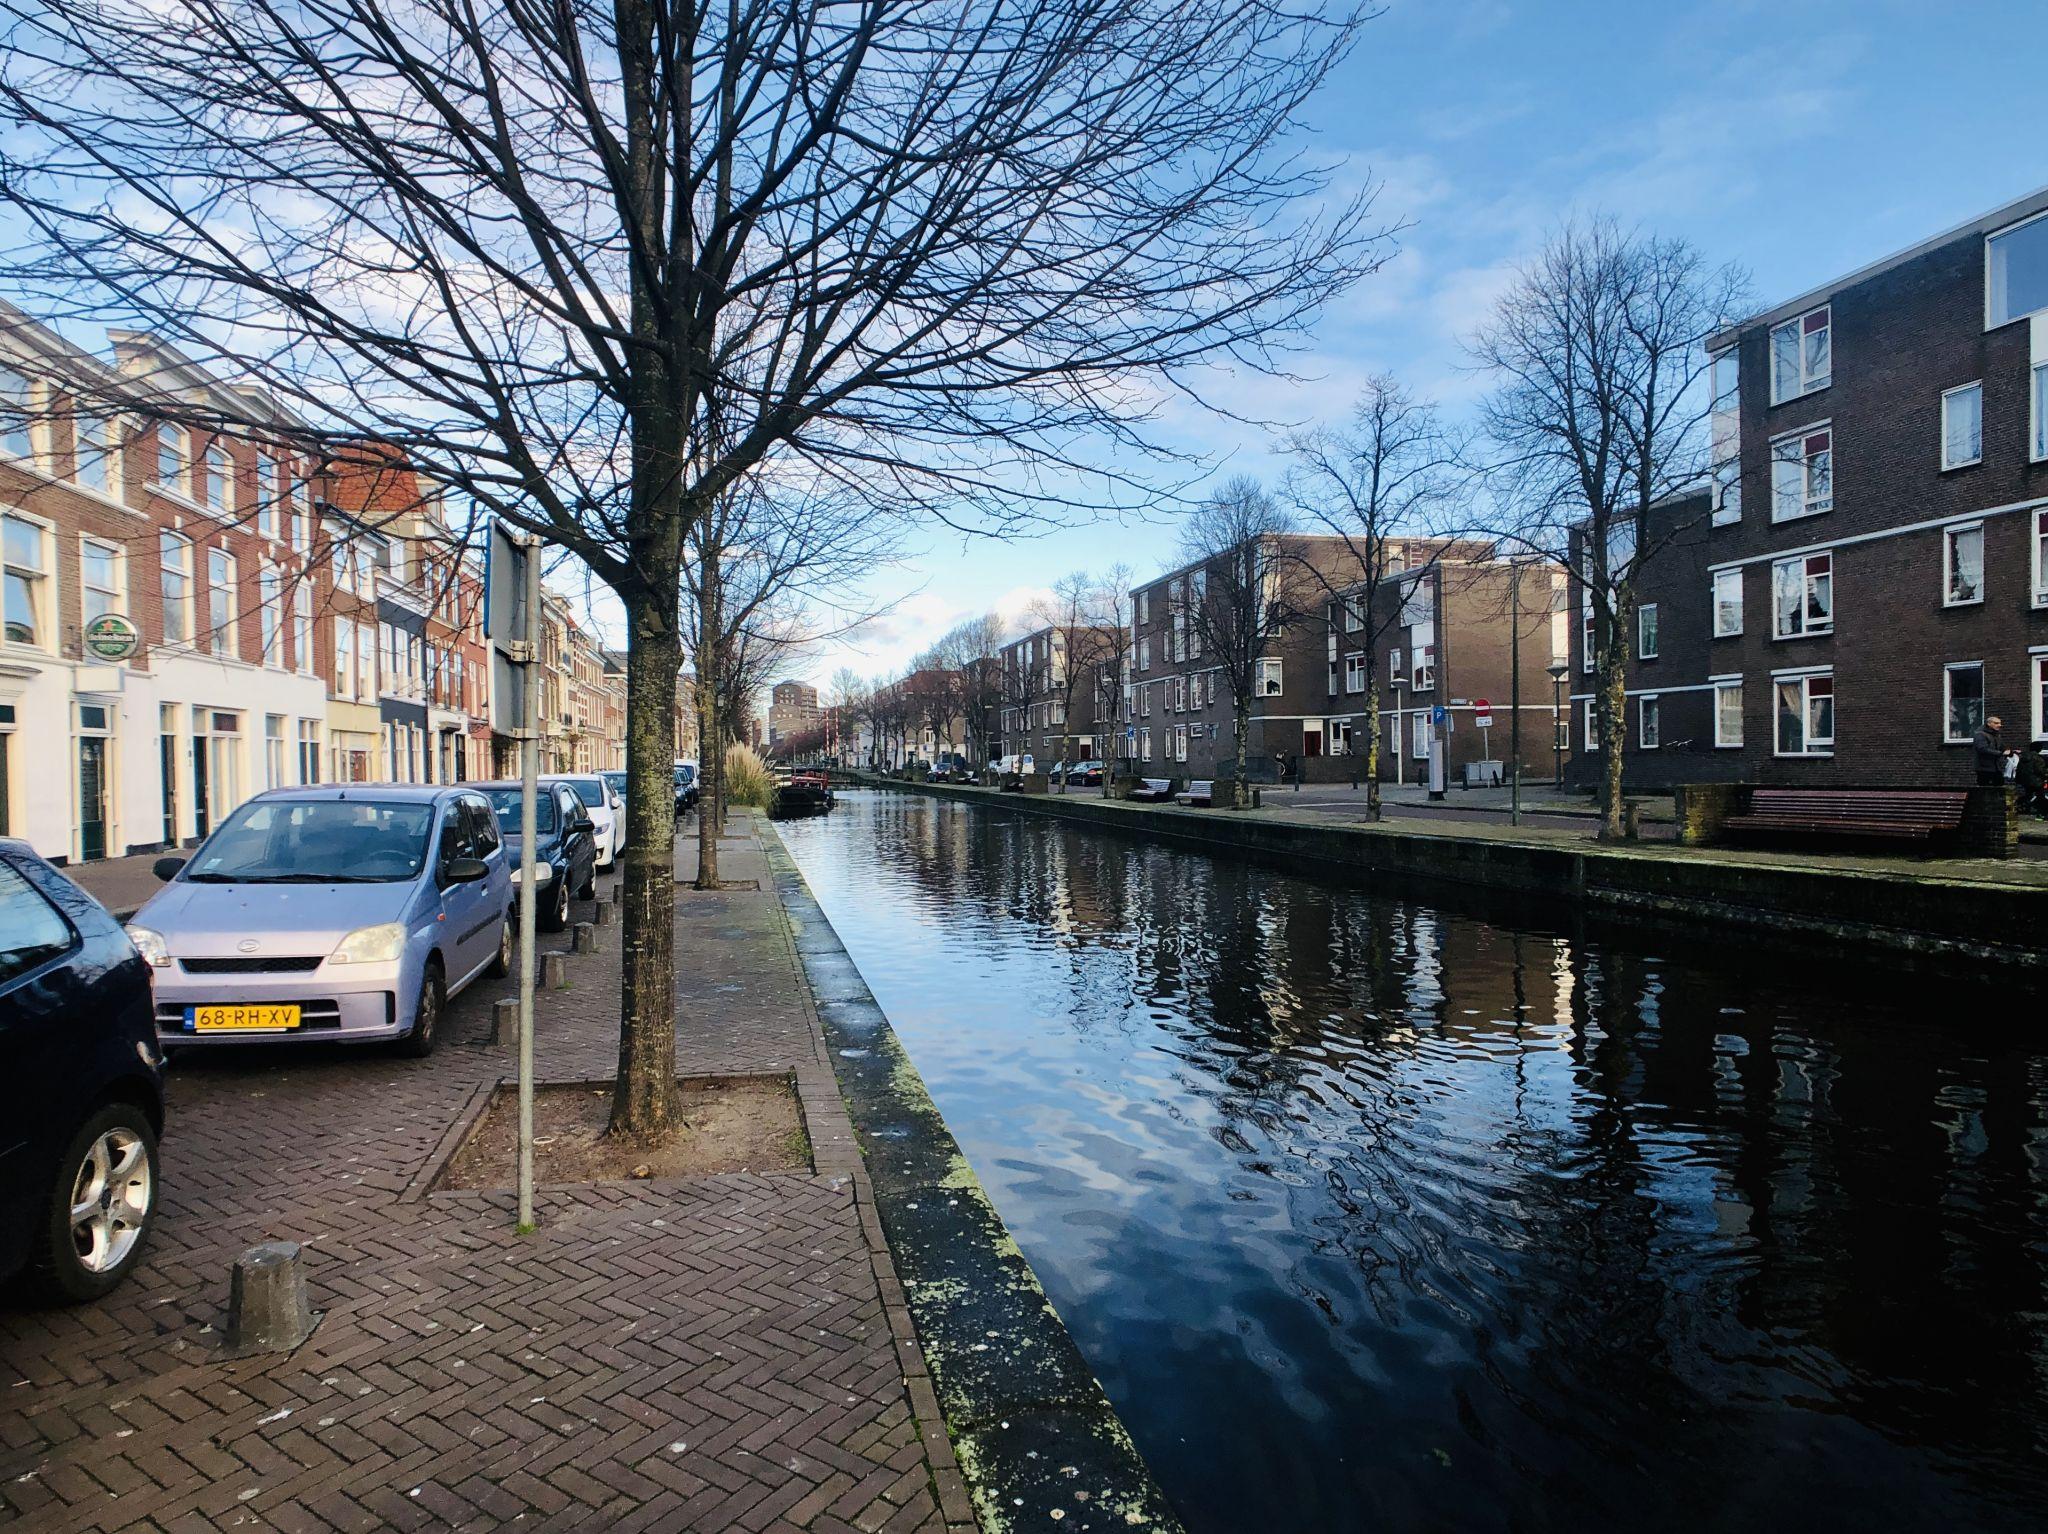 Verversings Kanaal, Netherlands